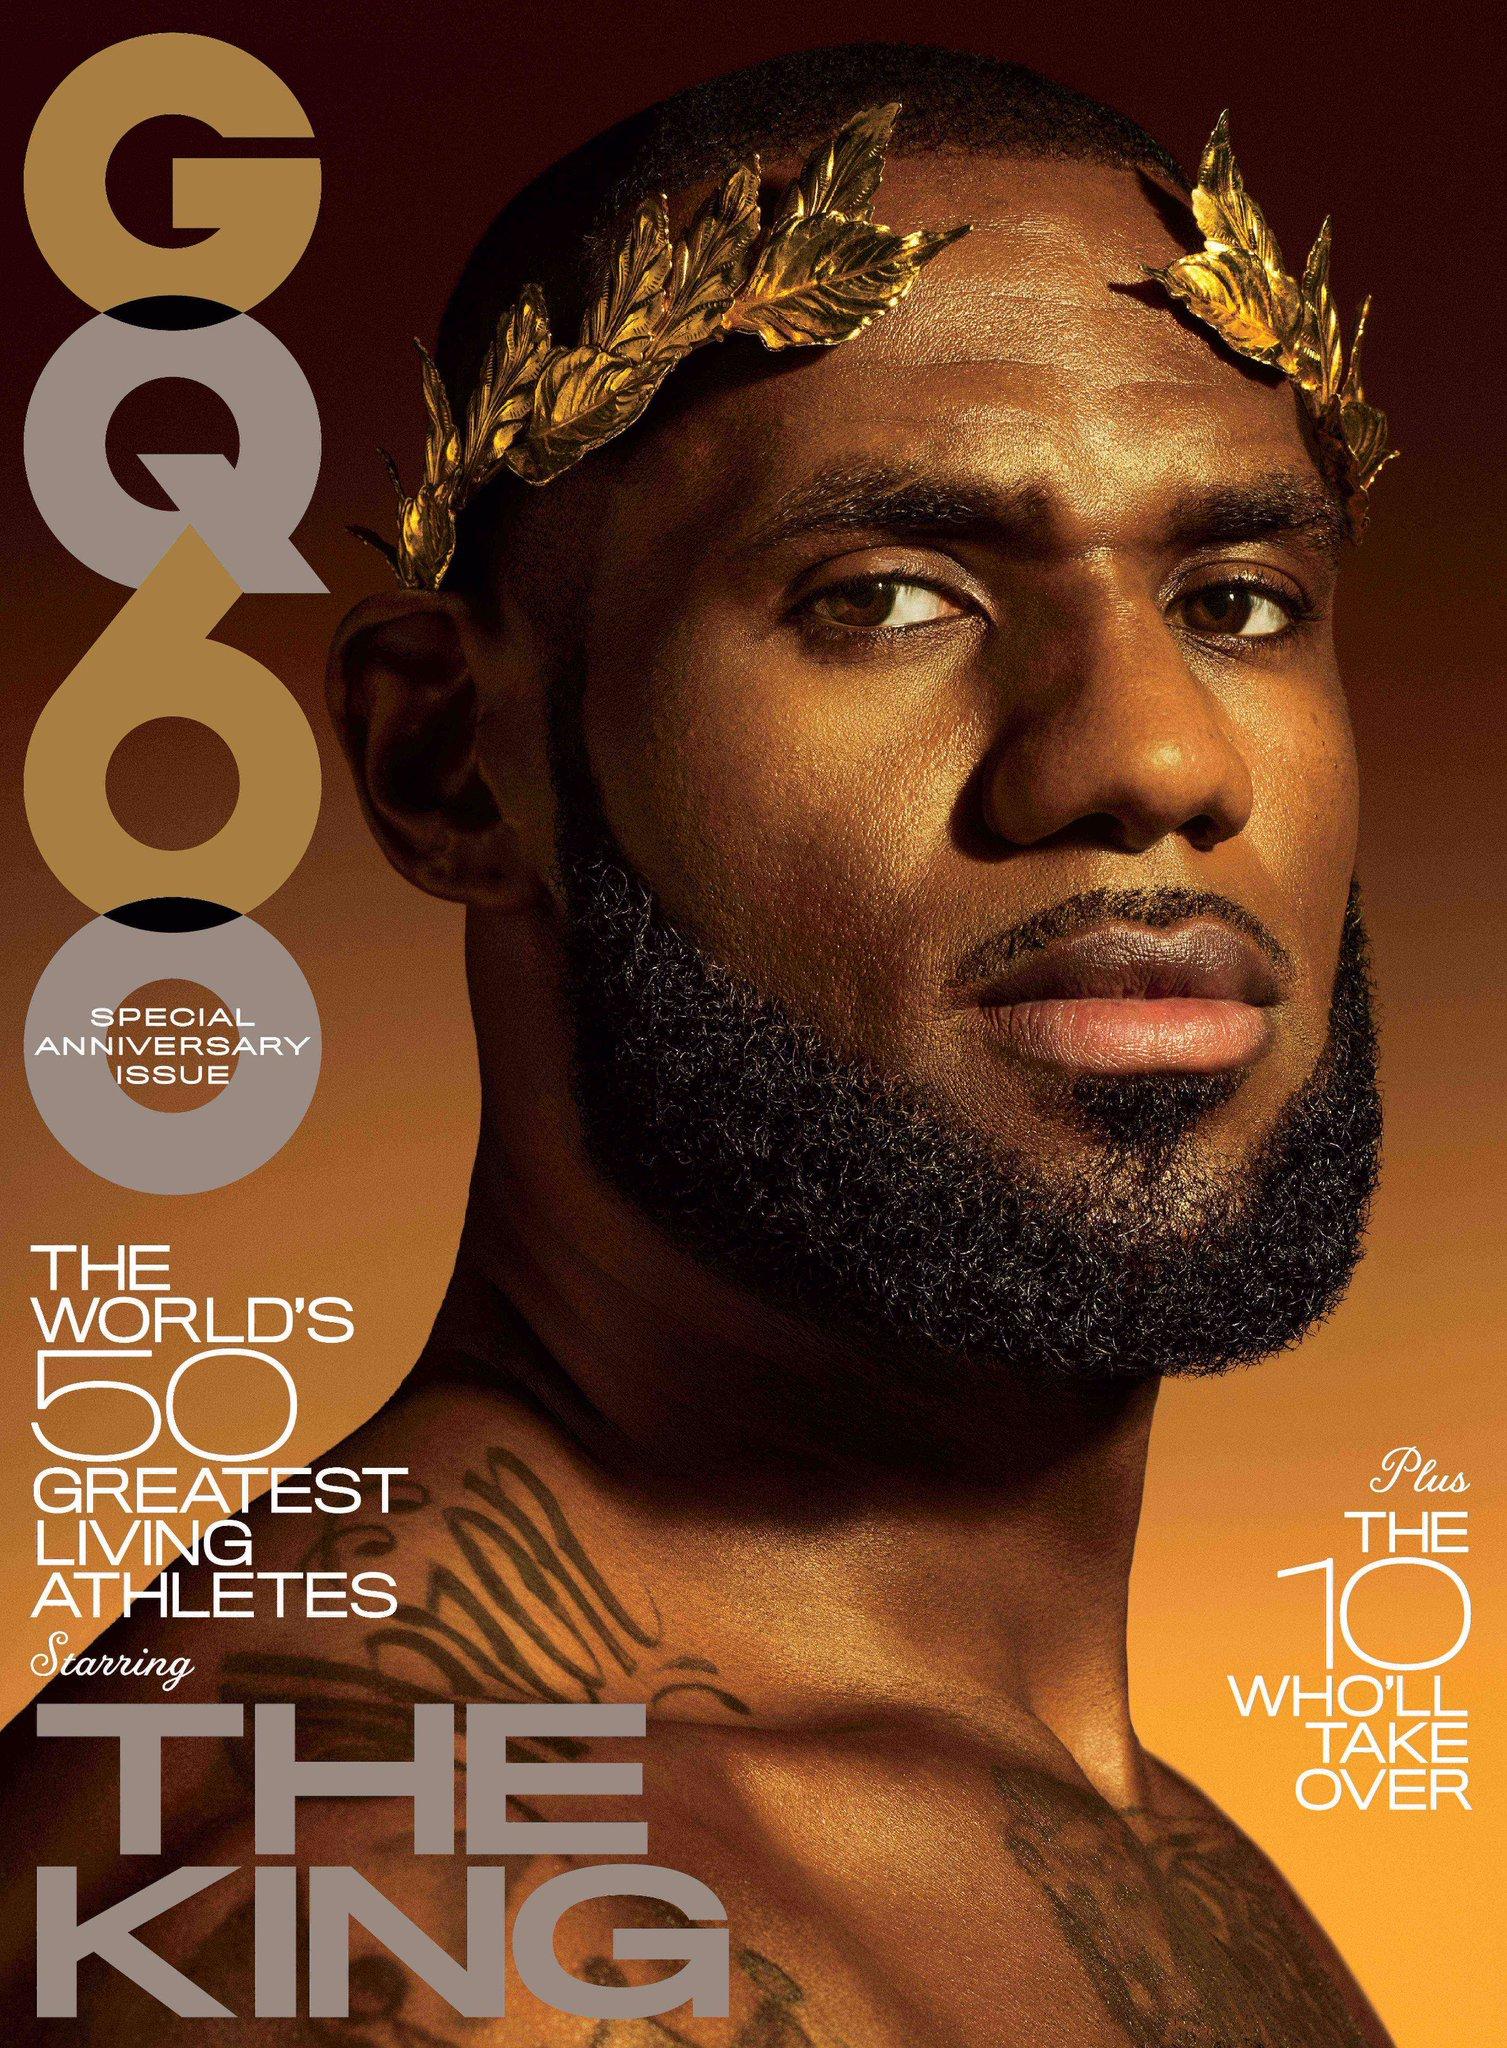 Presenting GQ's November cover star: LeBron James (@KingJames) https://t.co/oA6vvmJtcU https://t.co/pX0Mp0tBT5